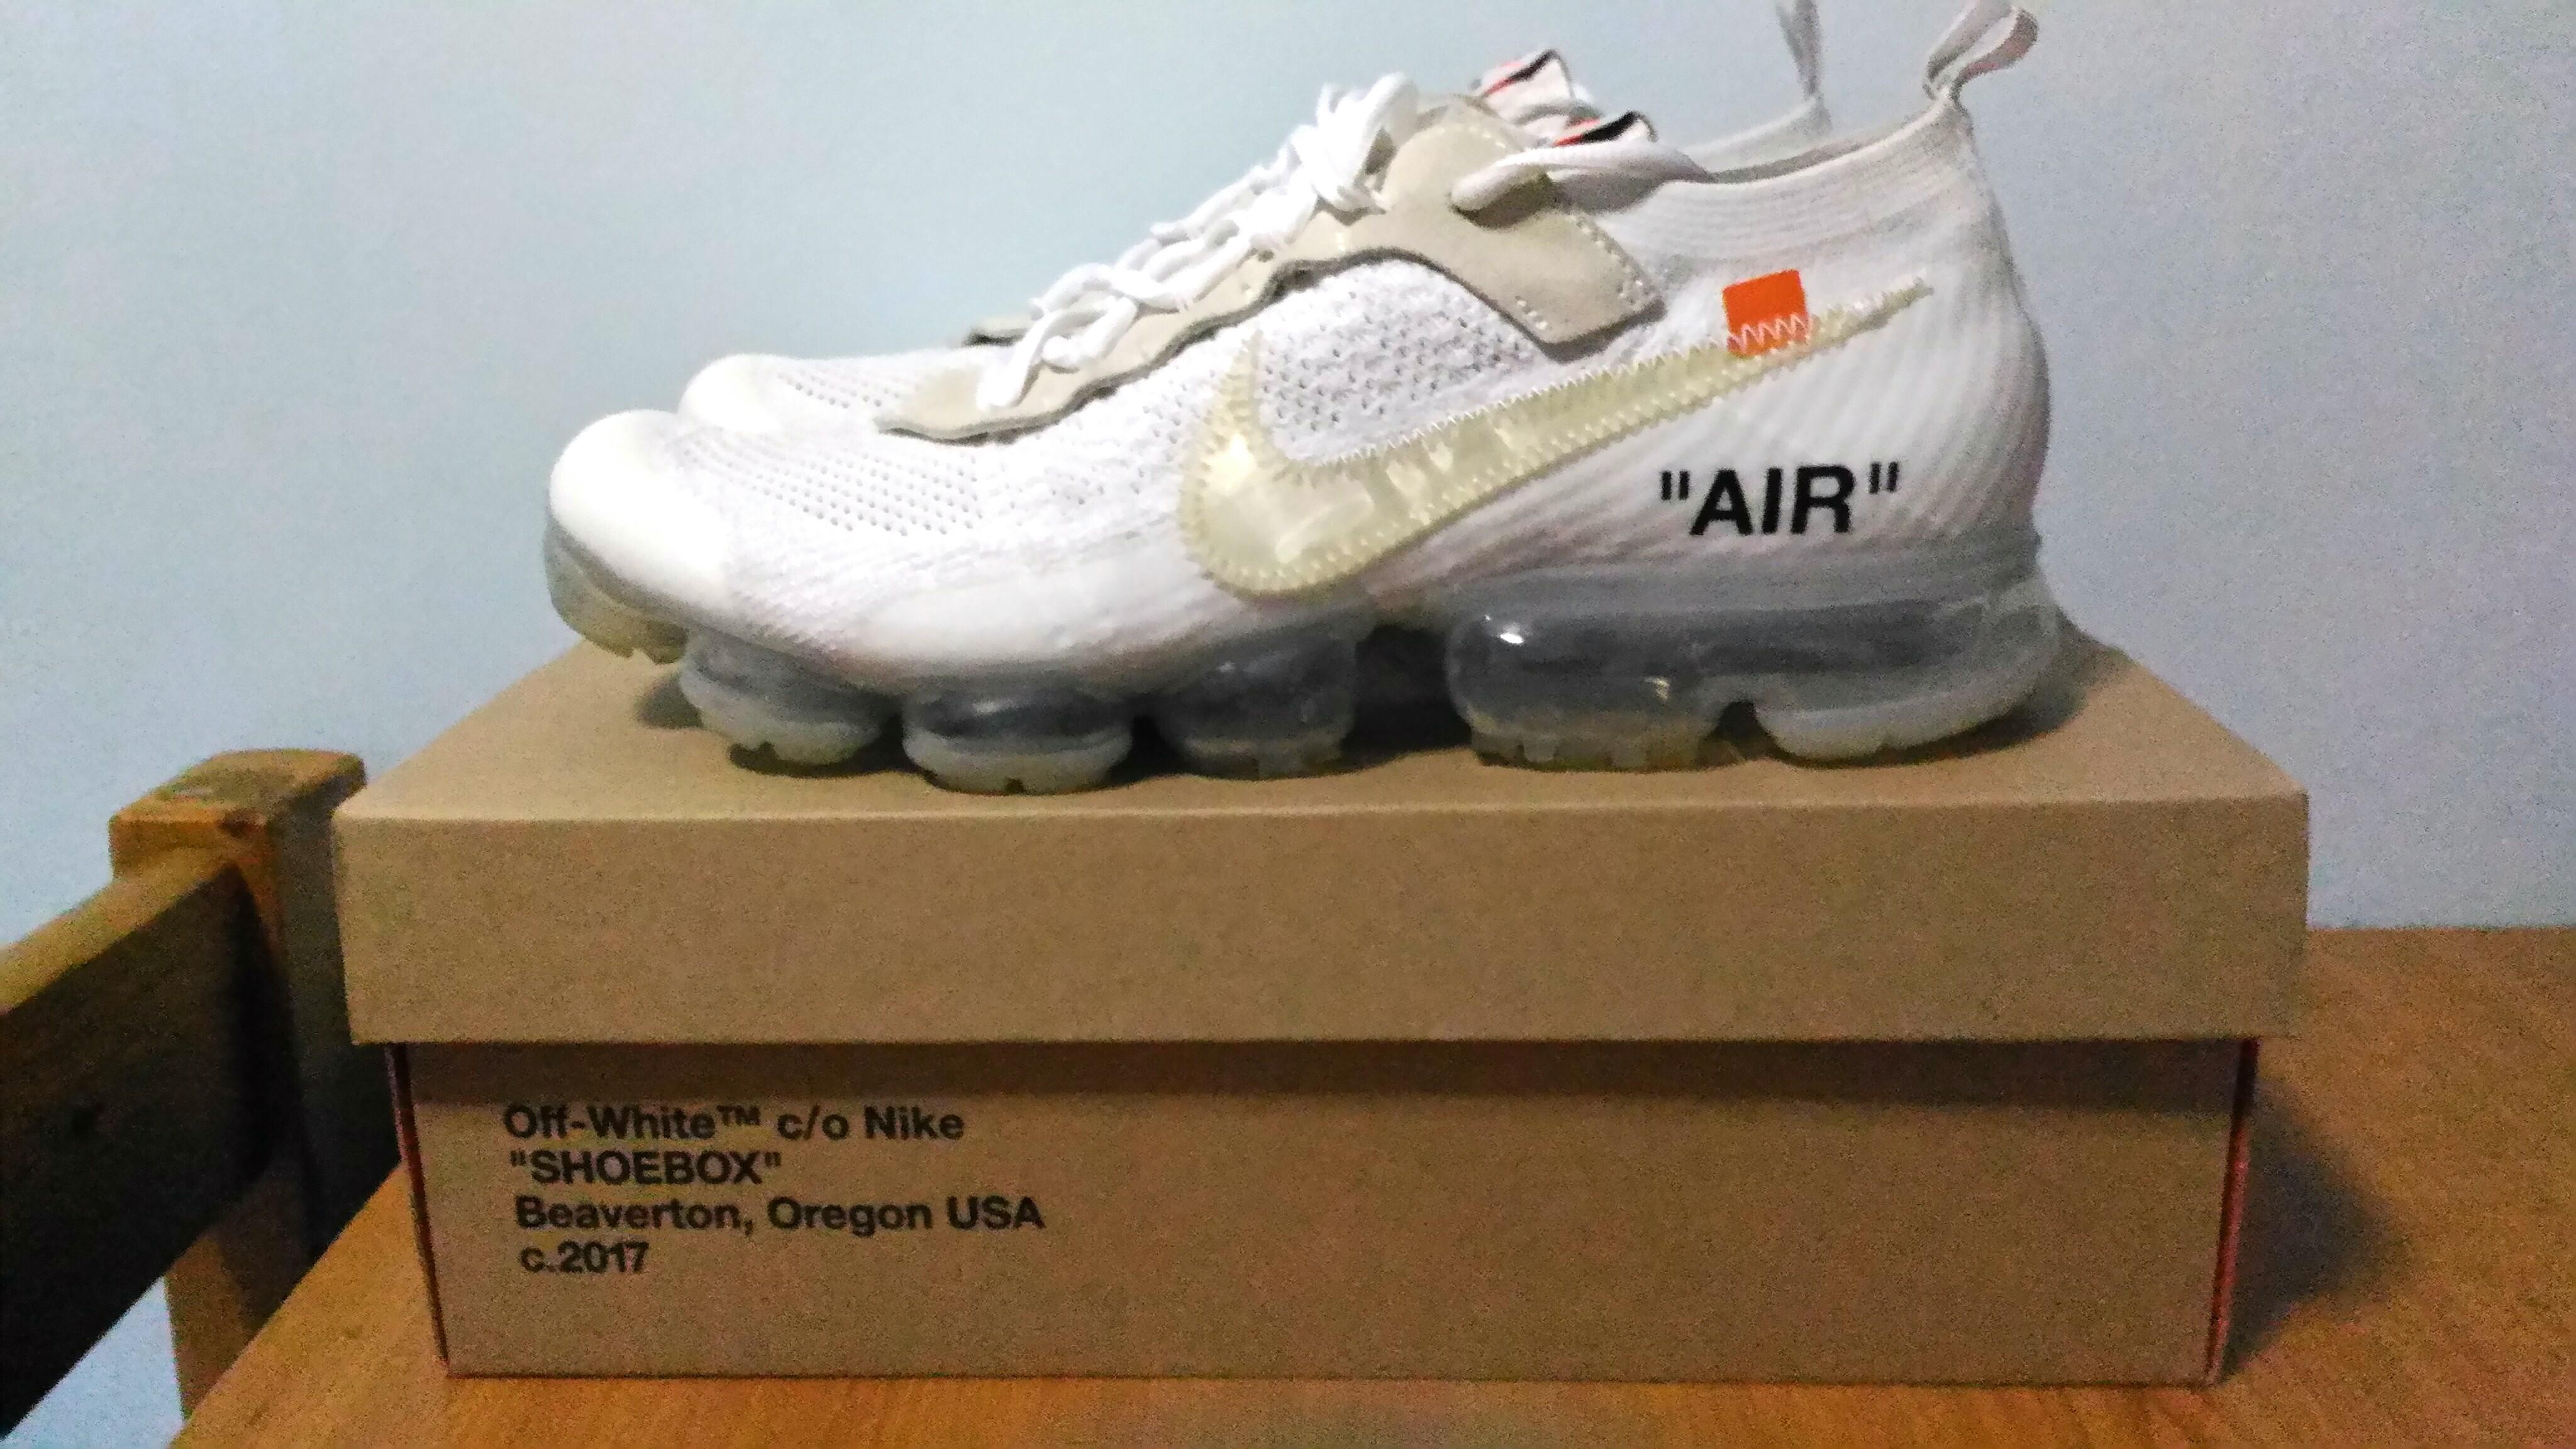 b910534d8c Off White nike vapormax, Men's Fashion, Footwear, Sneakers on Carousell